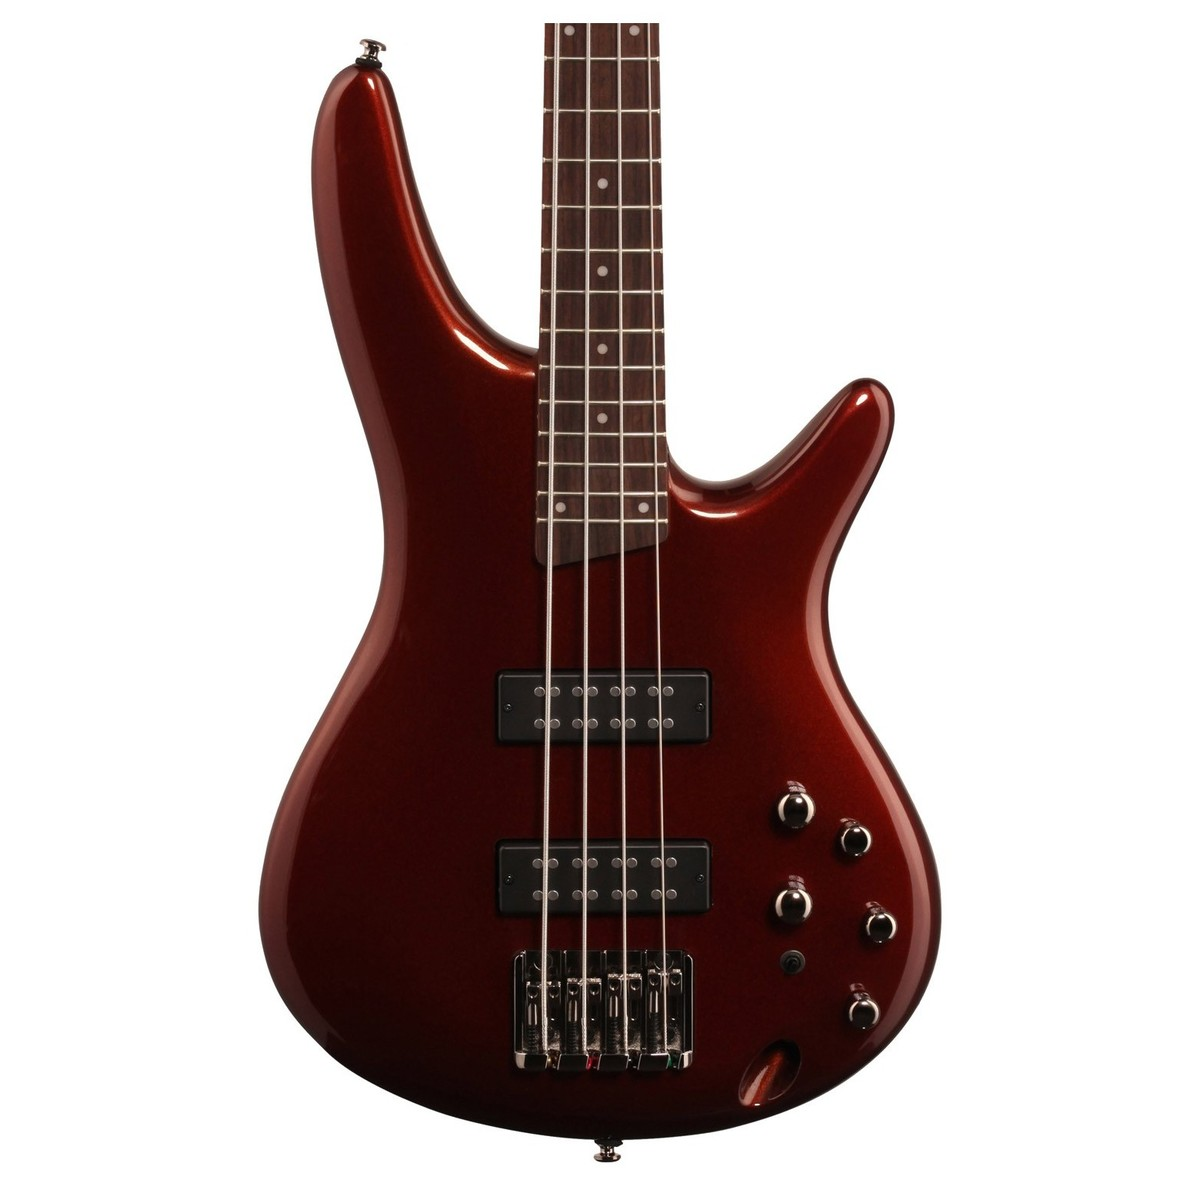 ibanez sr300e bass guitar root beer metallic at. Black Bedroom Furniture Sets. Home Design Ideas